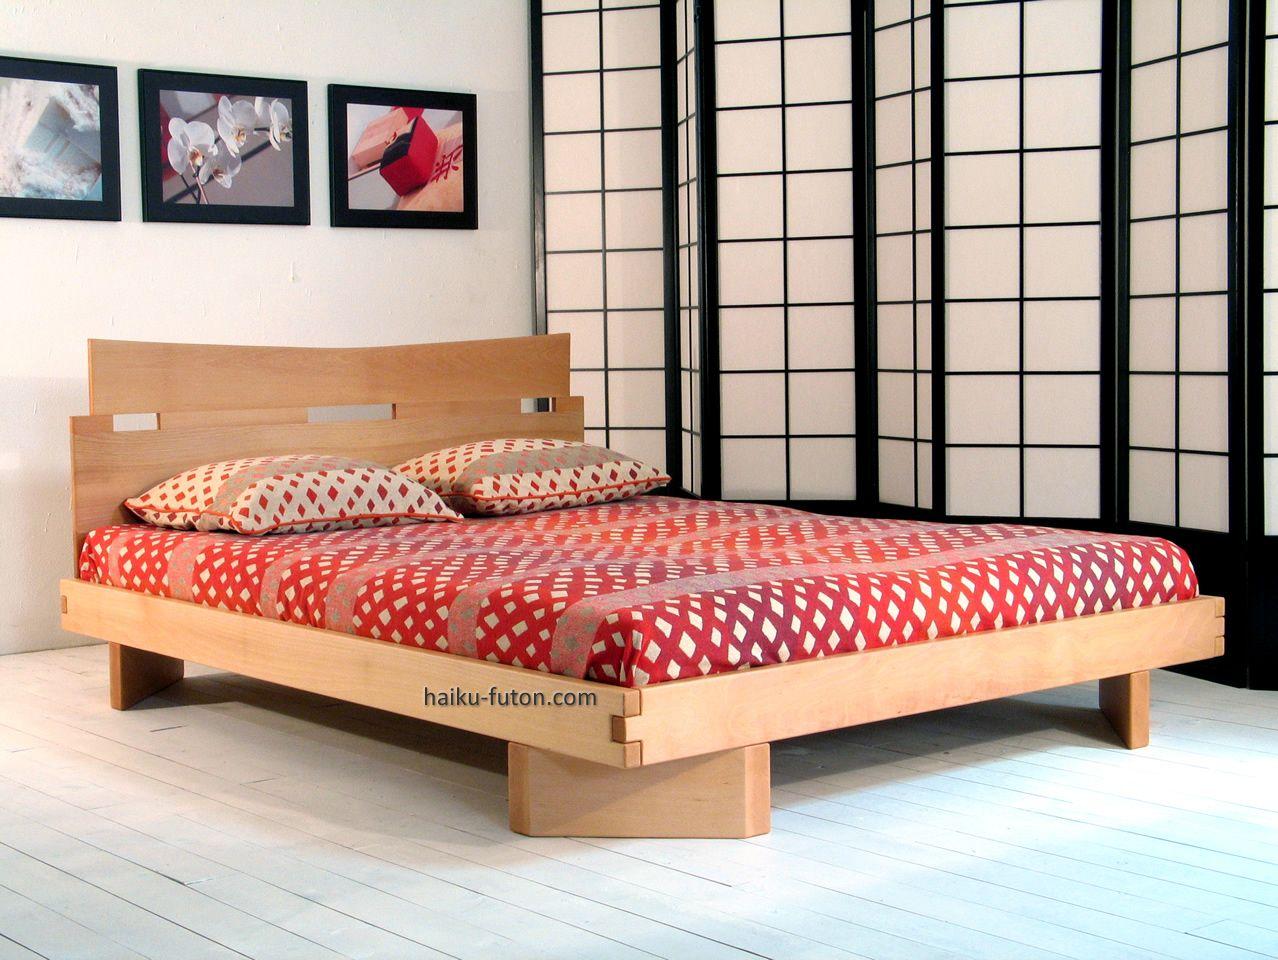 Pin de JenRs en For the Home | Pinterest | Estructura de la cama ...